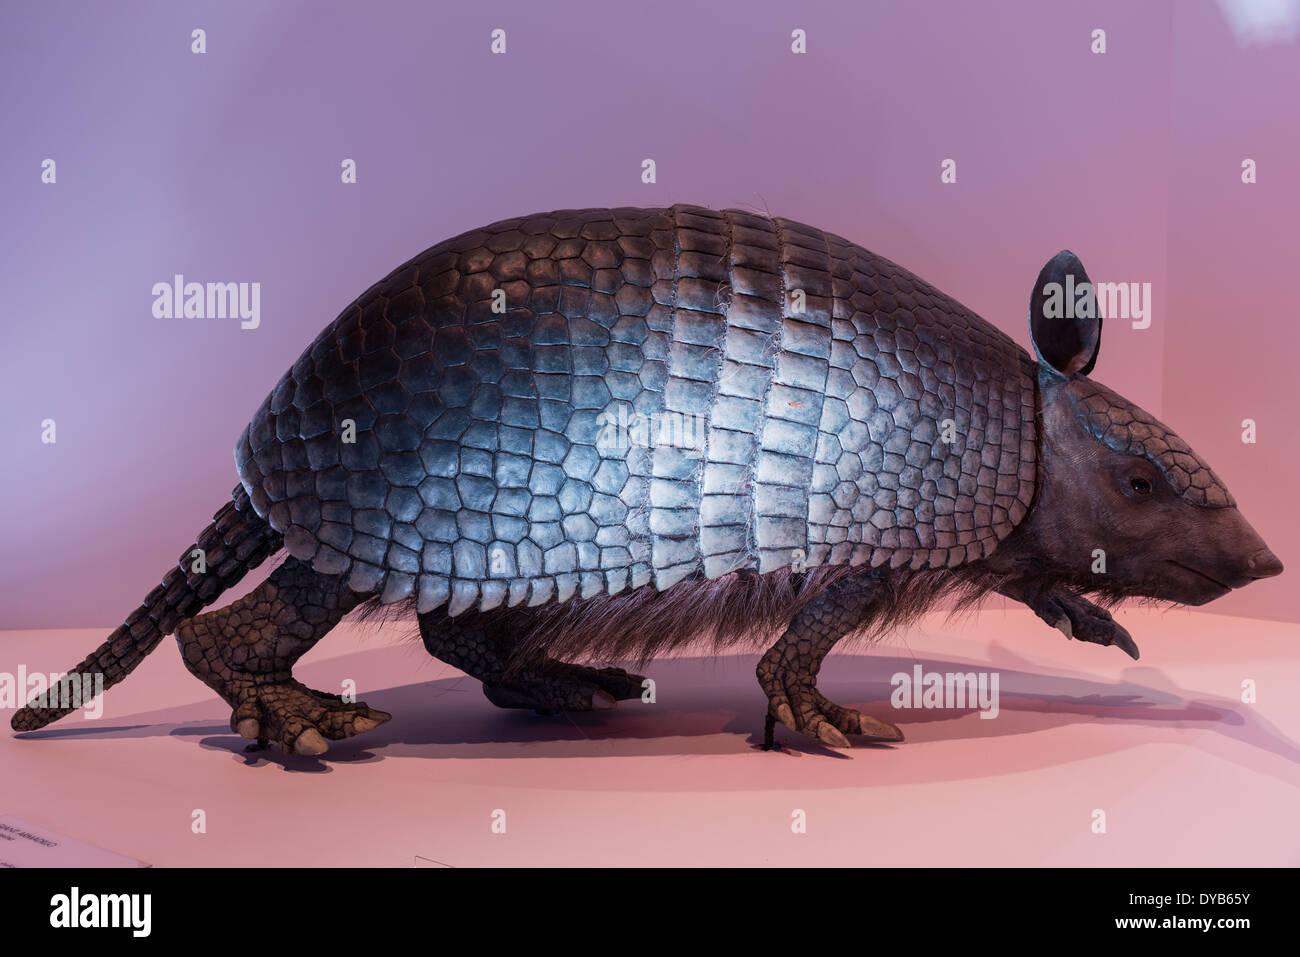 Modelo de un extinto armadillo gigante (Holmesina) en exhibición en un museo. Foto de stock